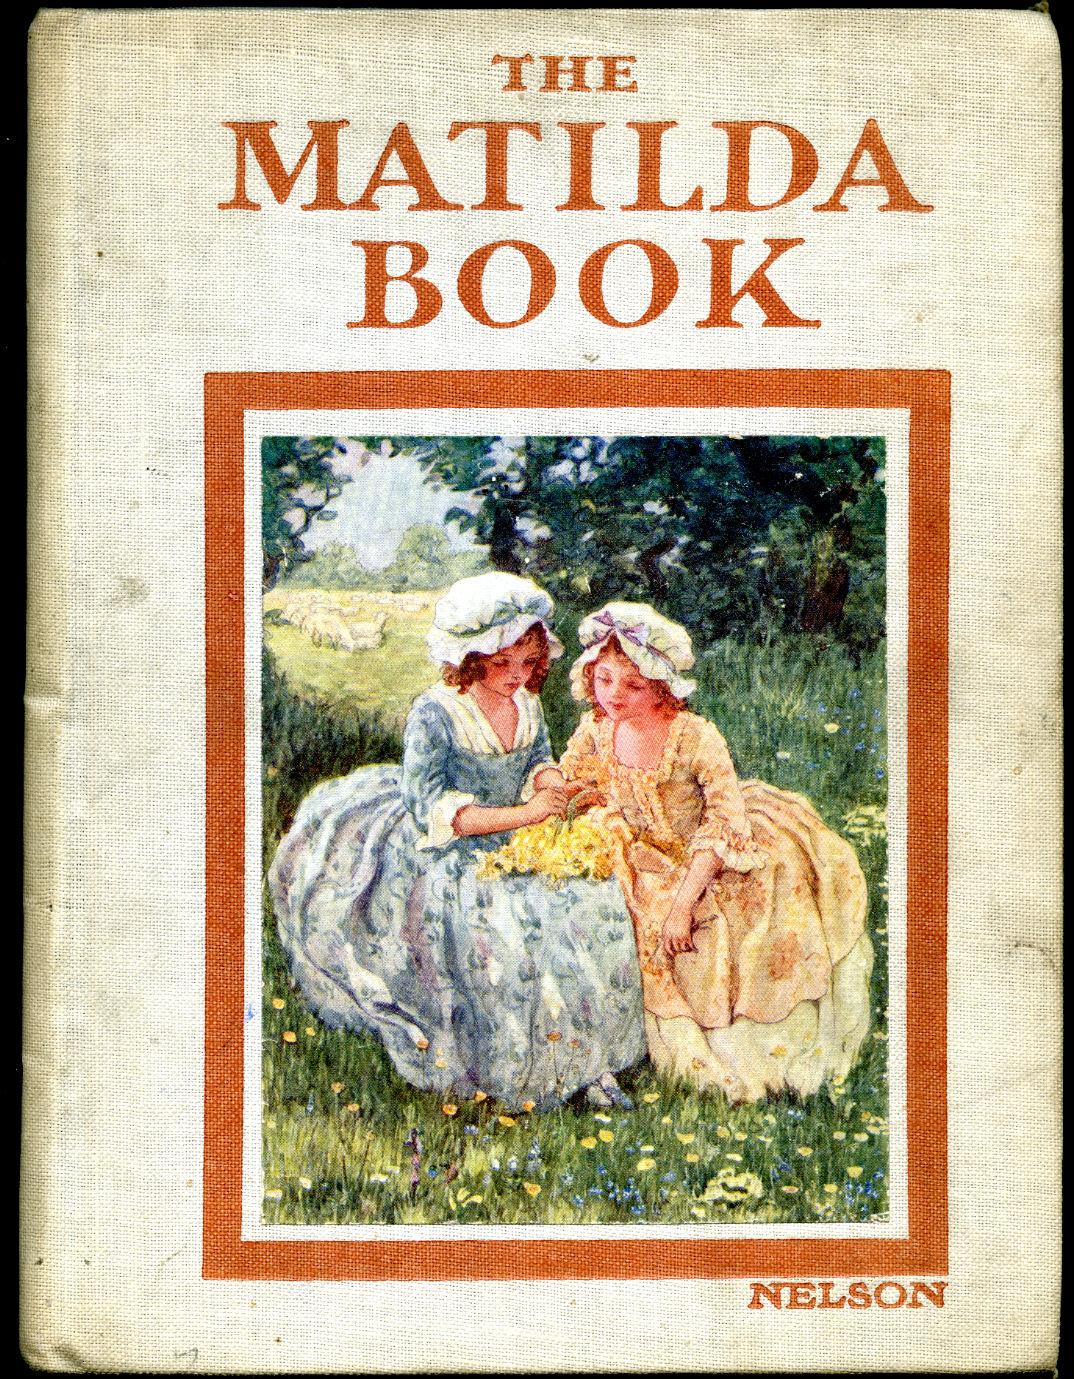 WOOD, ELSIE ANNA (ILLUSTRATOR) VERSES BY JACQUELINE CLAYTON - The Matilda Book